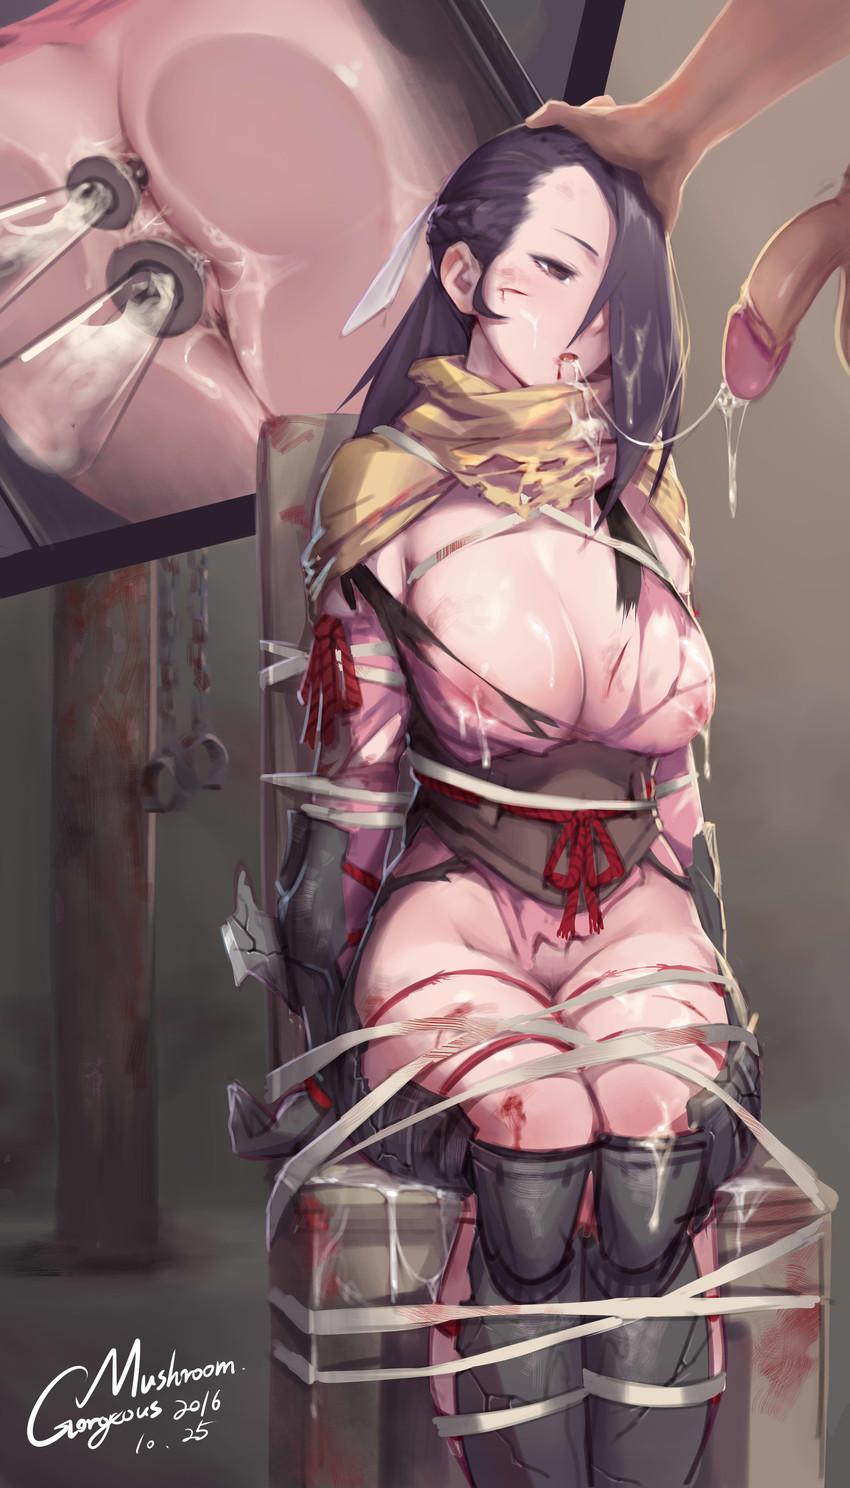 Toy bdsm bondage hentai